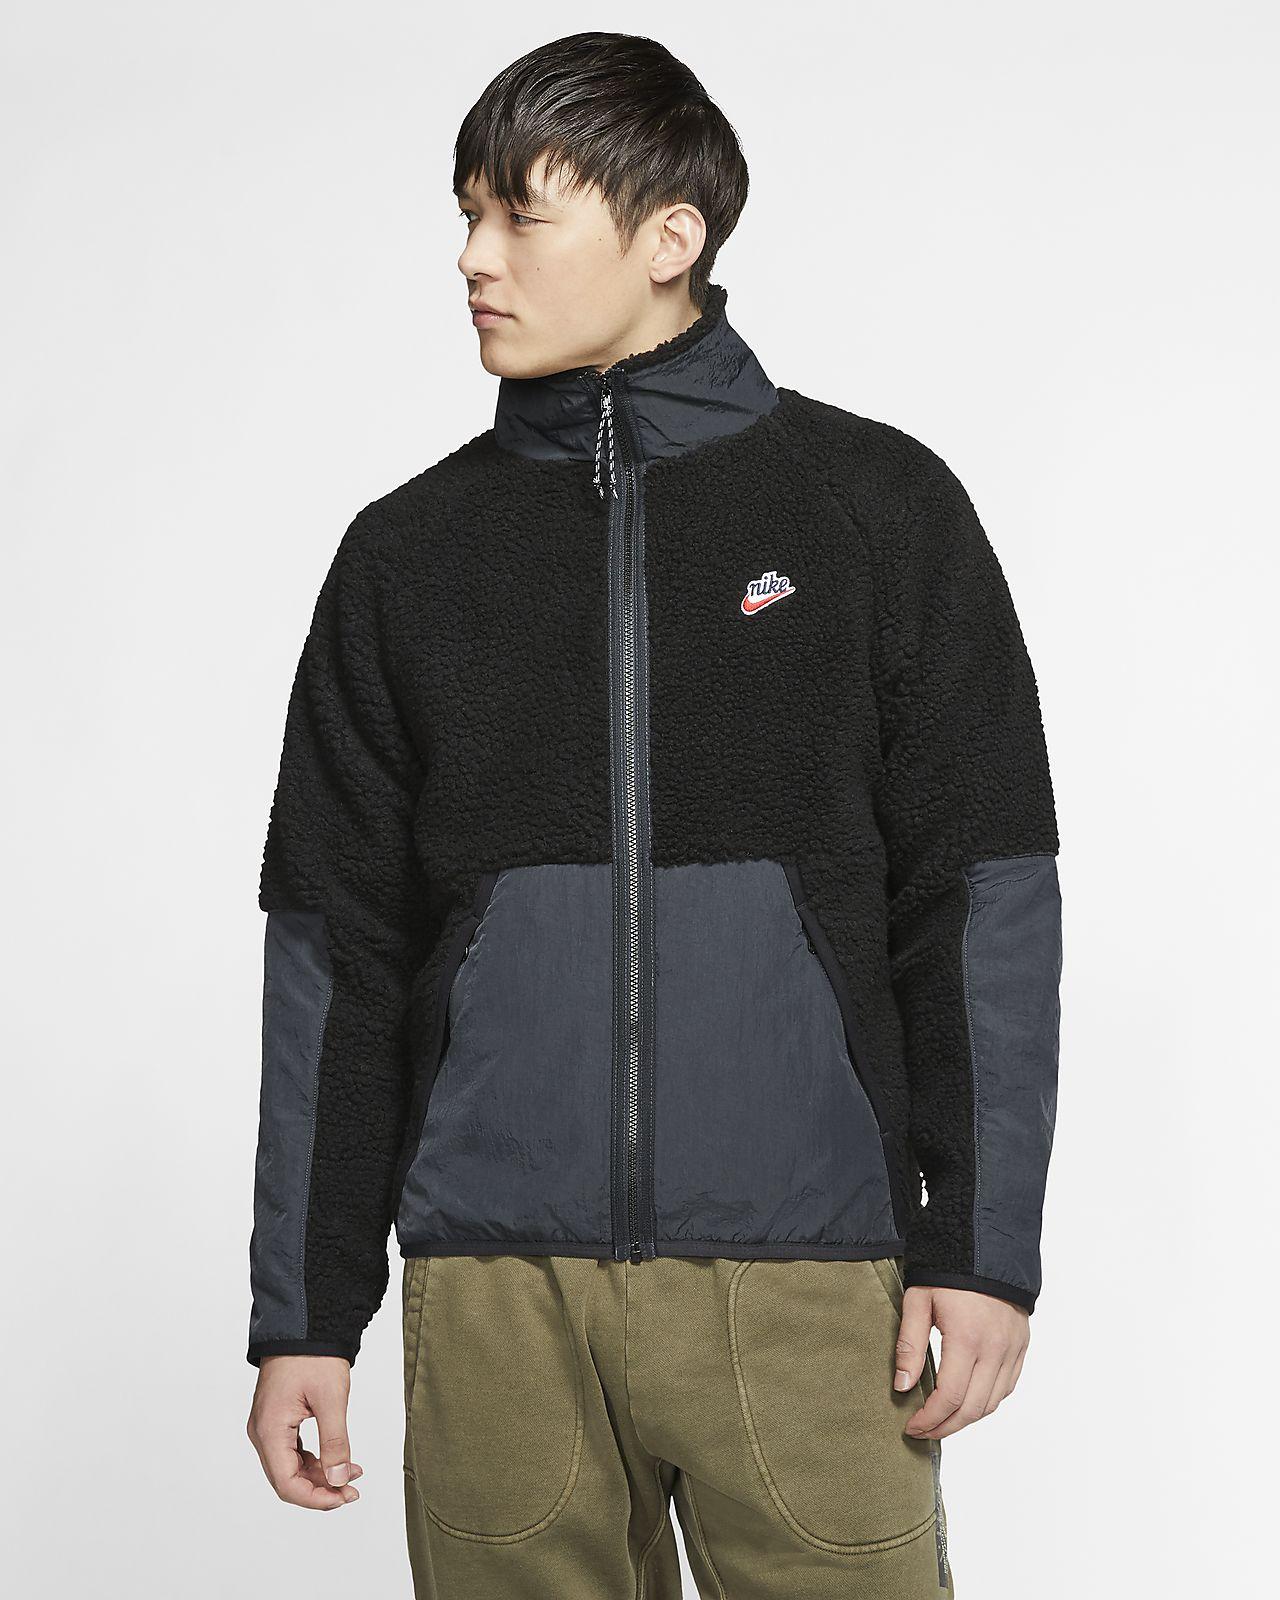 Casaco de lã cardada de Sherpa Nike Sportswear para homem